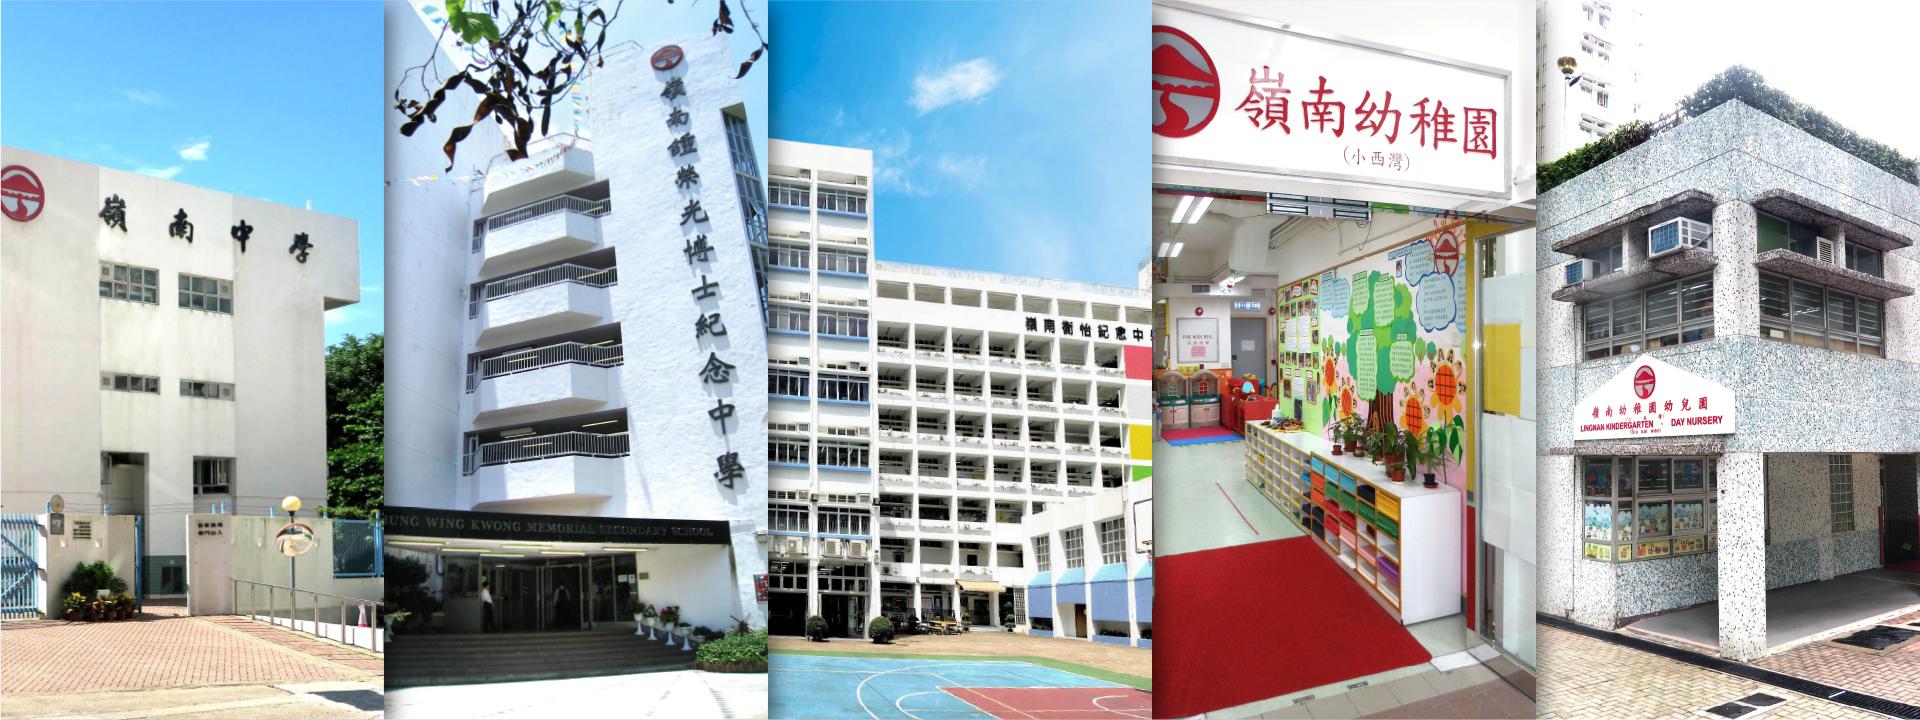 lingnan-education-slide-2